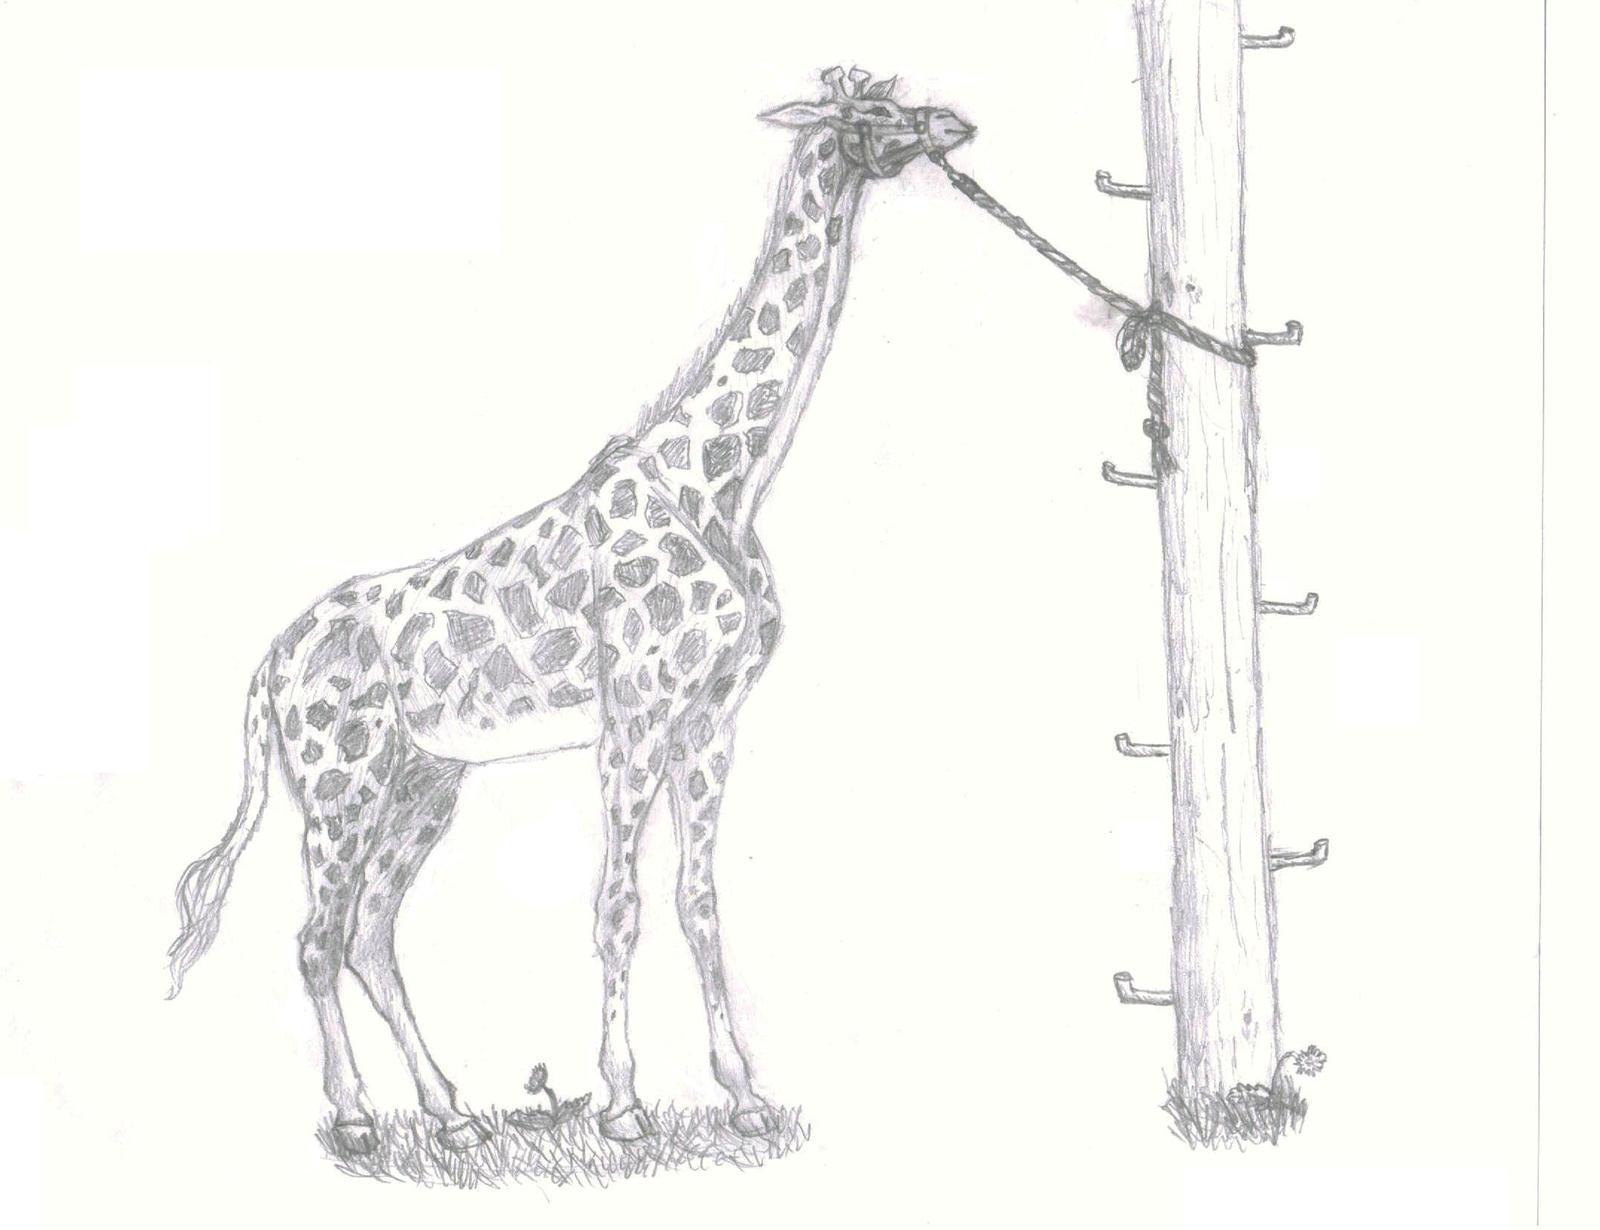 Giraffe Tied to Telephone Pole